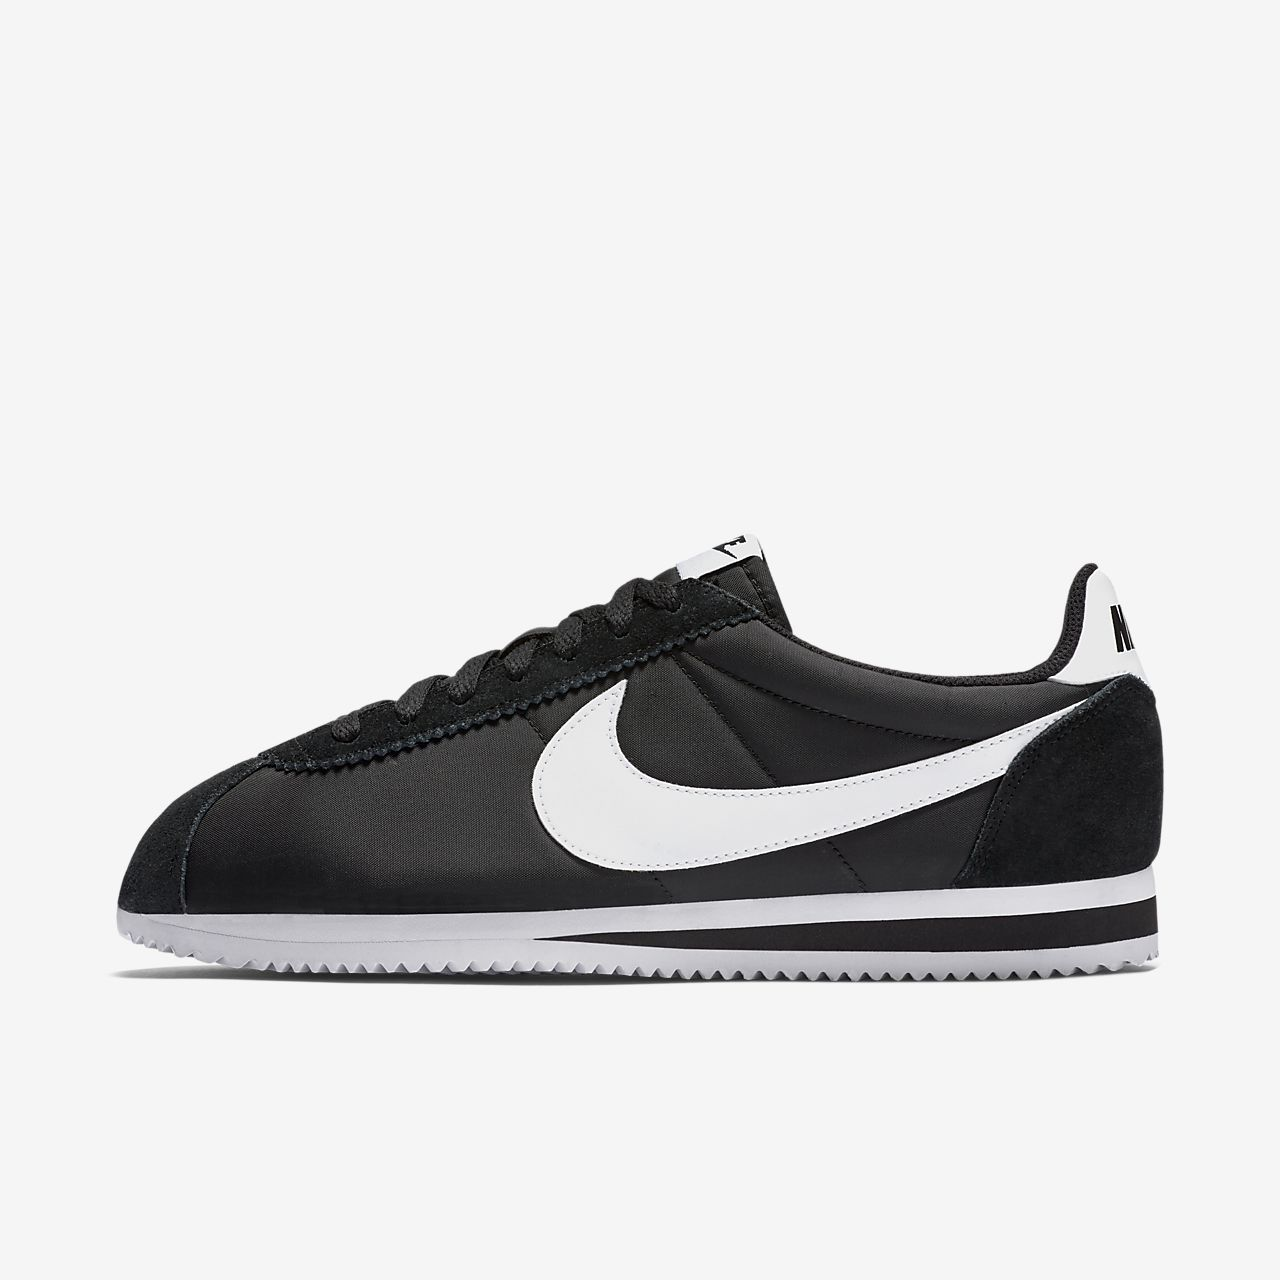 new concept 7a57b 59a1c ... Buty uniseks Nike Classic Cortez Nylon